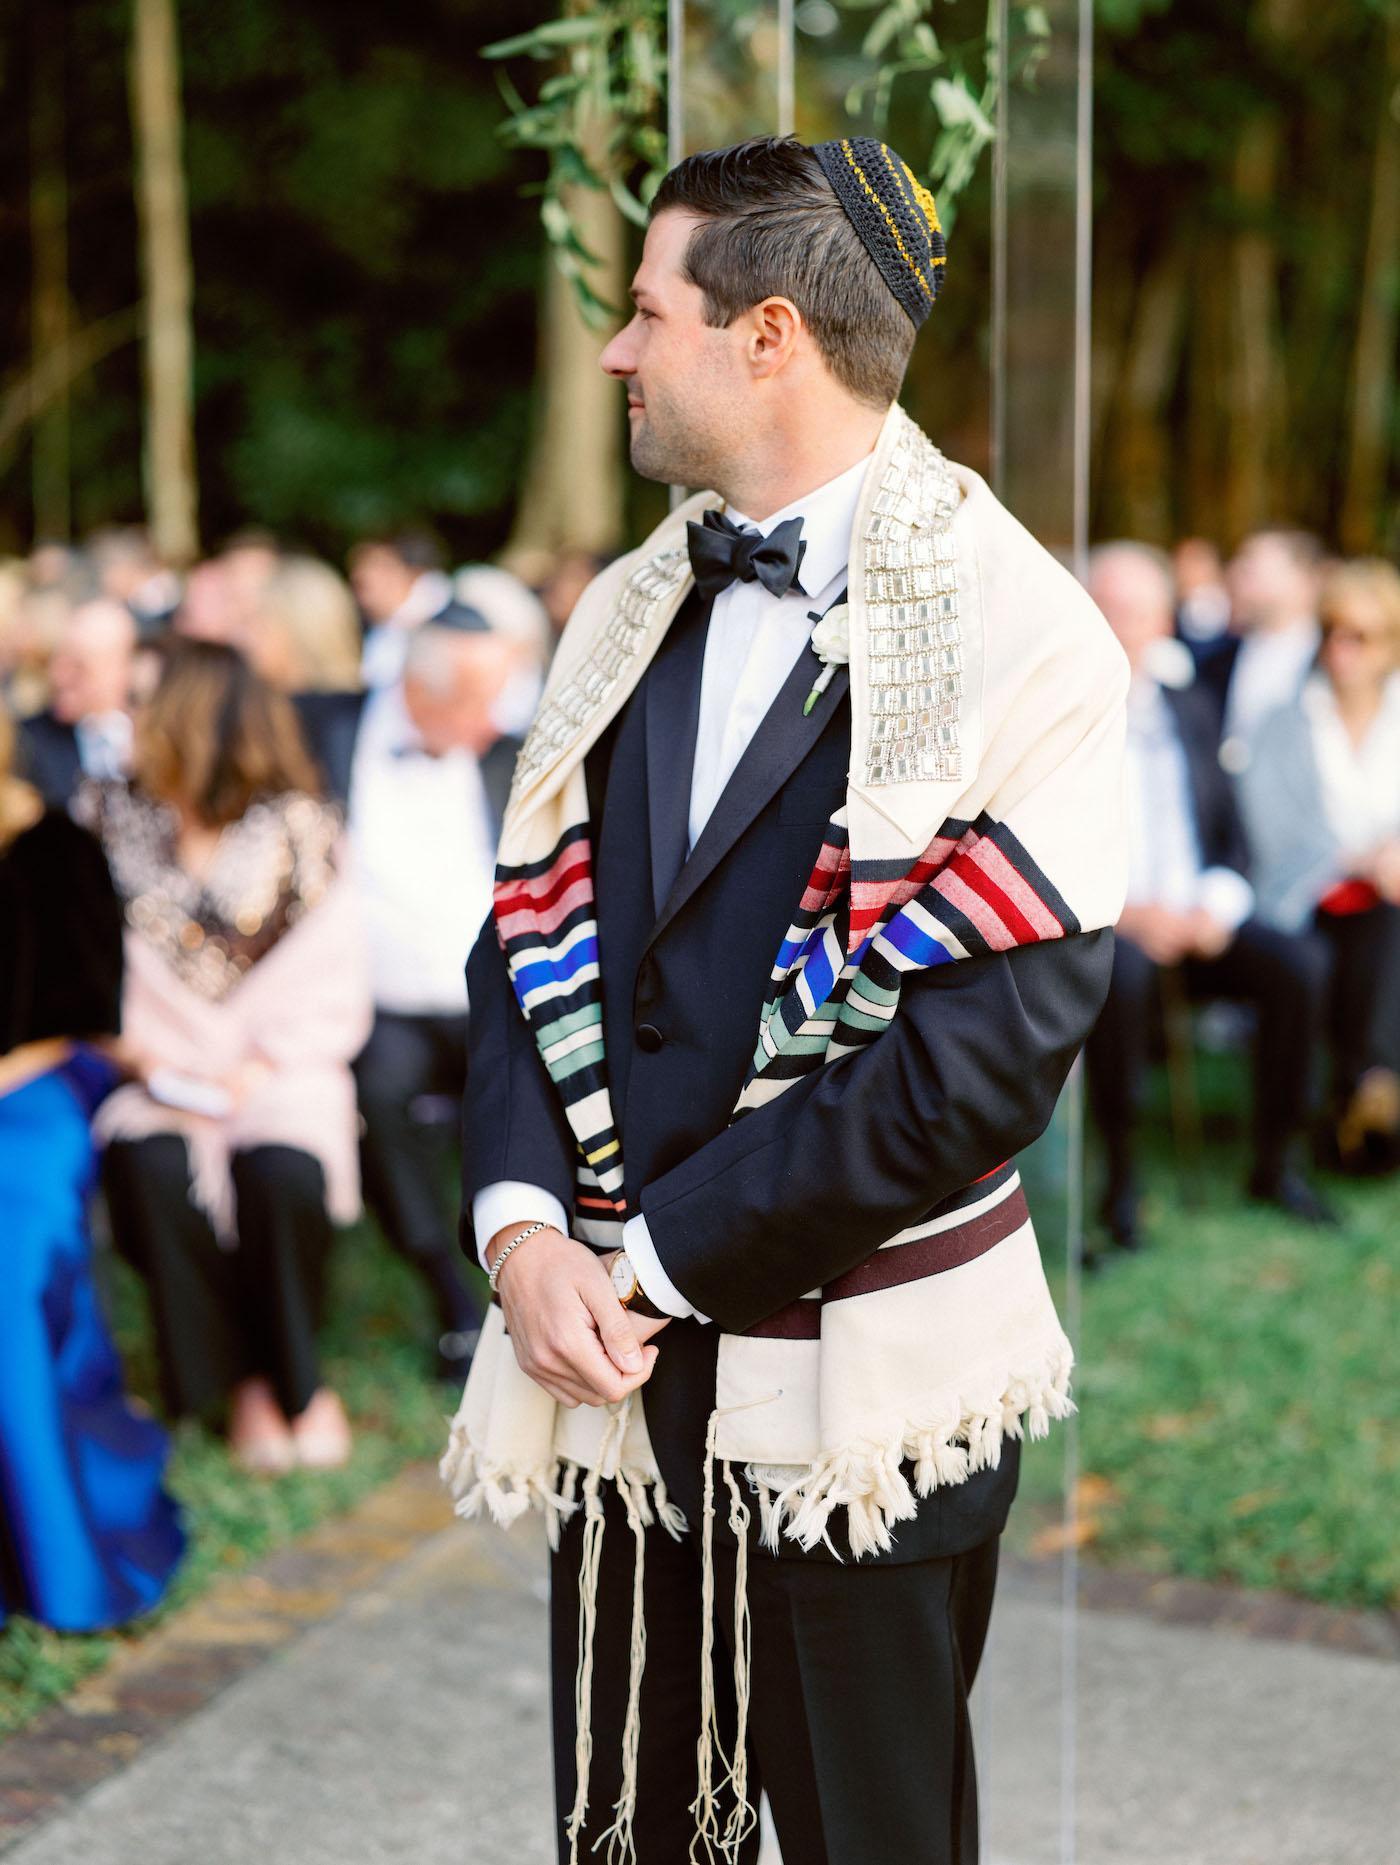 Florida Groom Waiting During Wedding Ceremony, Traditional Jewish Outdoor Wedding